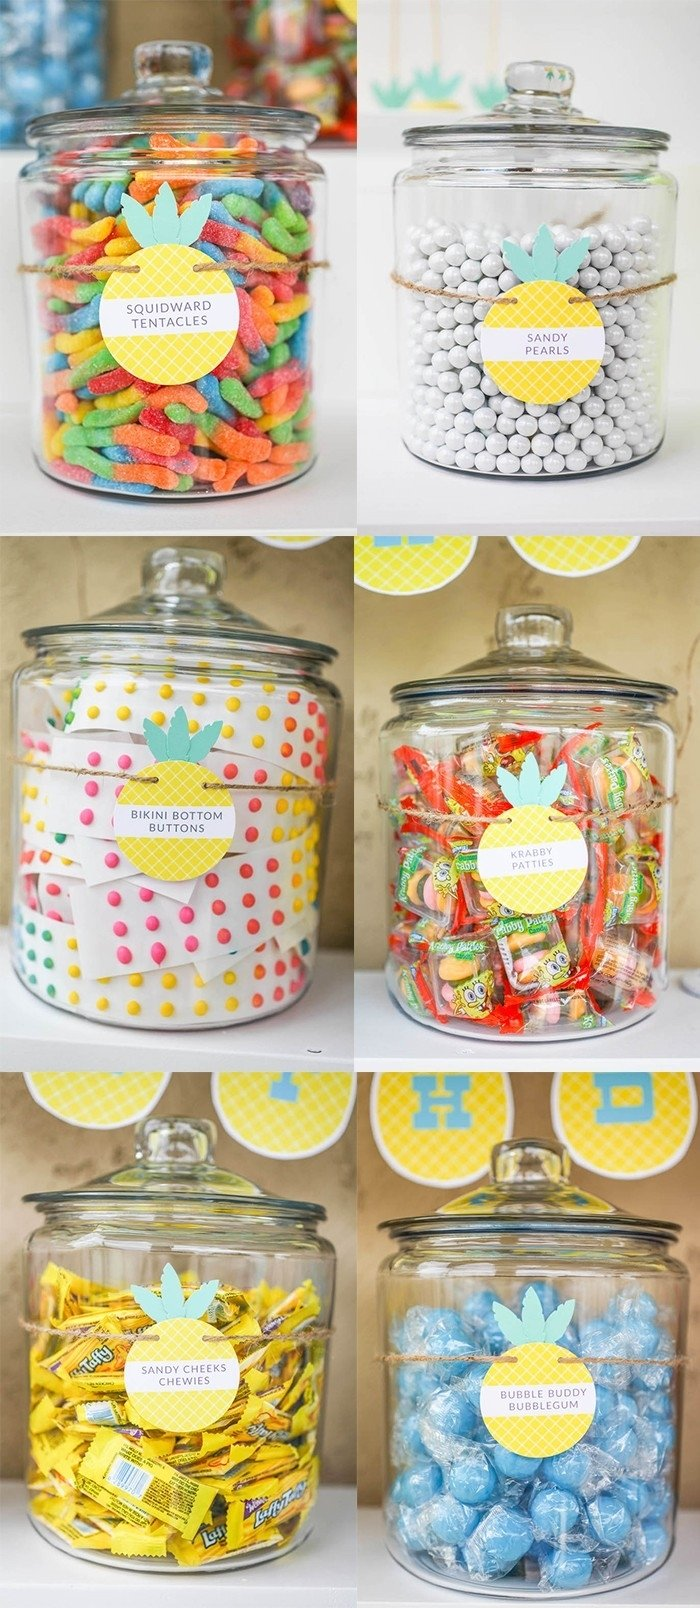 10 Trendy Spongebob Birthday Party Food Ideas spongebob squarepants birthday party 2020